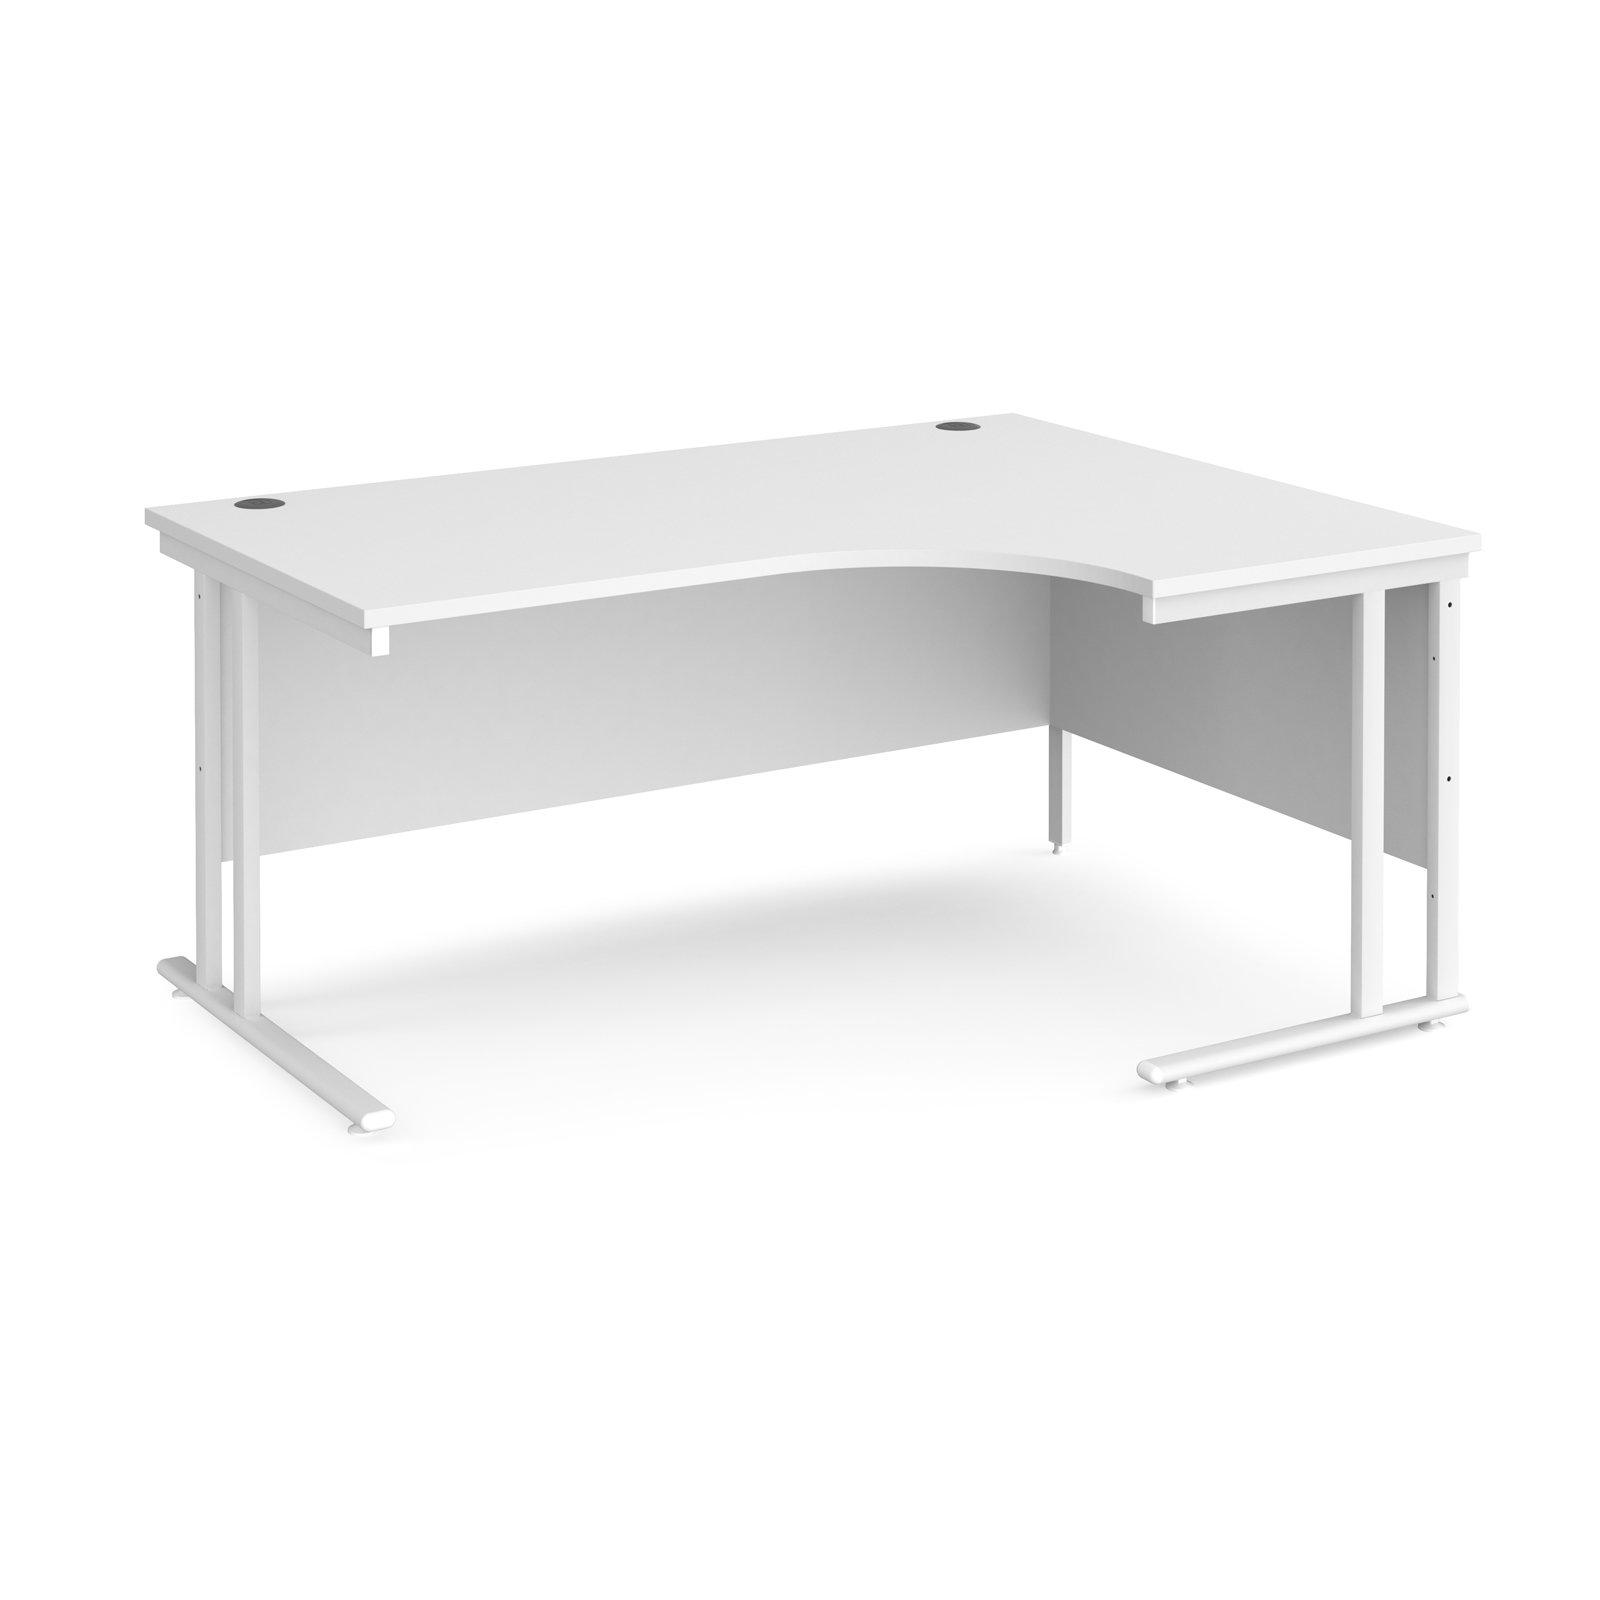 Maestro 25 right hand ergonomic desk 1600mm wide - white cantilever leg frame and white top